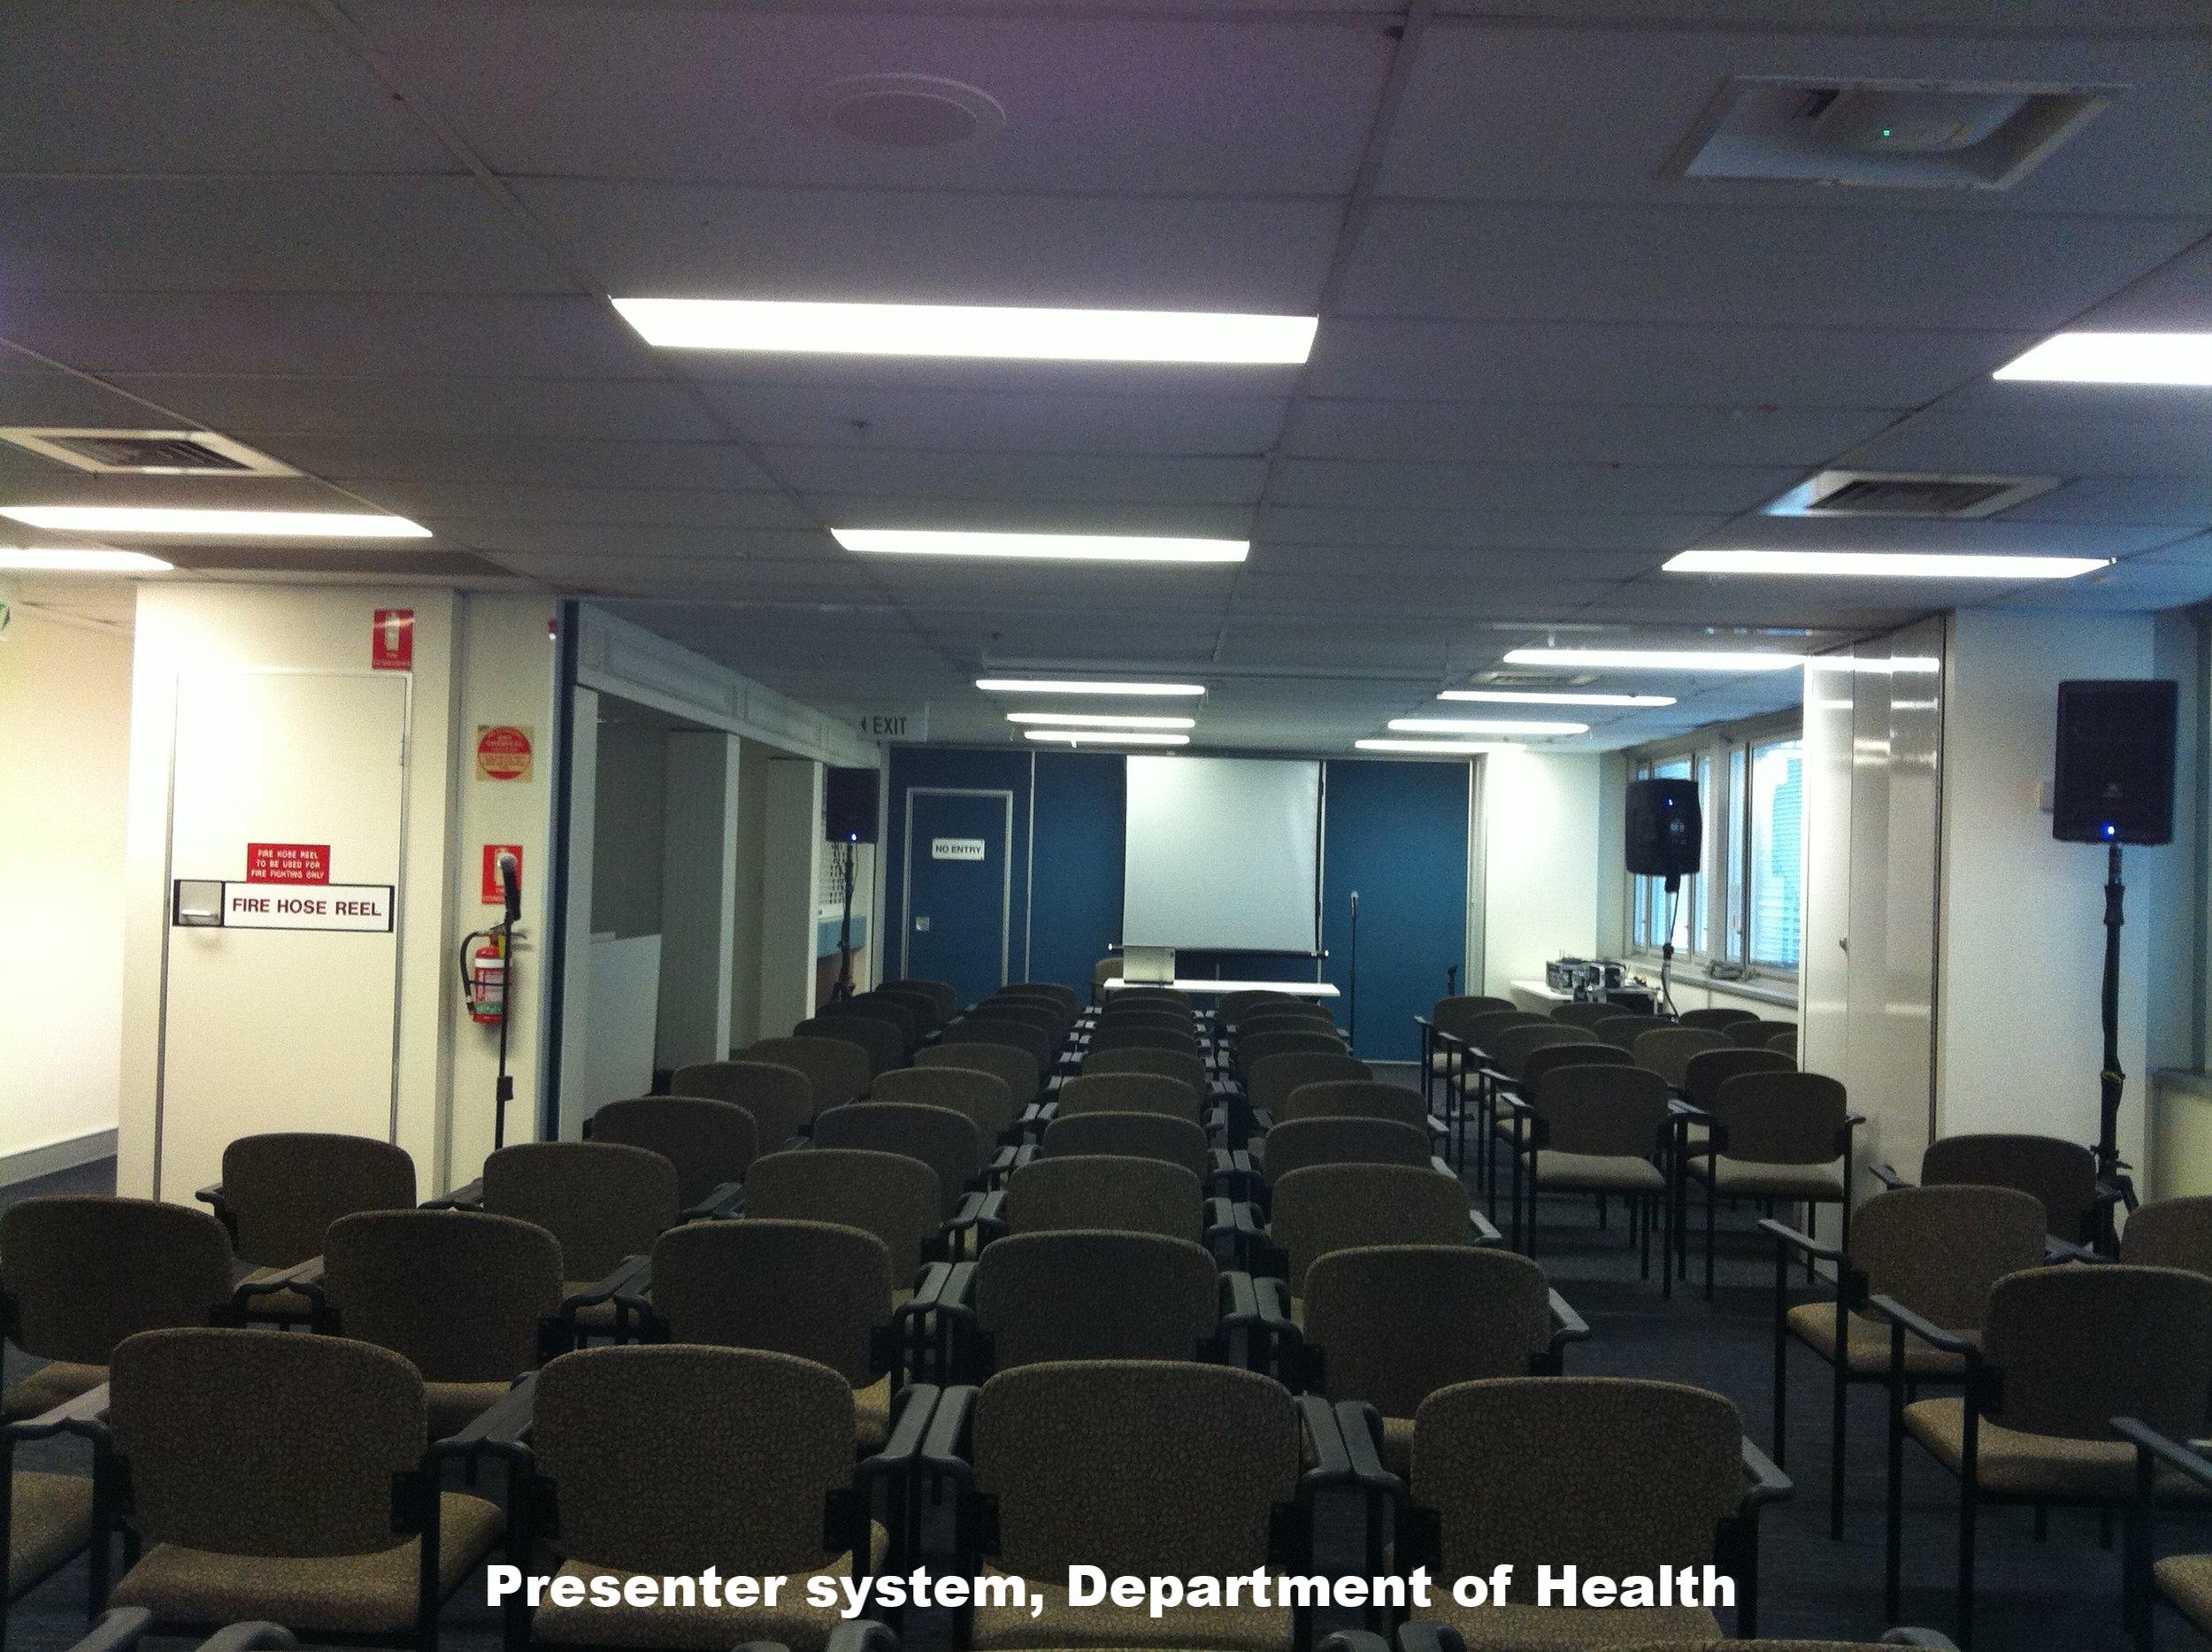 Presenter system 008.JPG